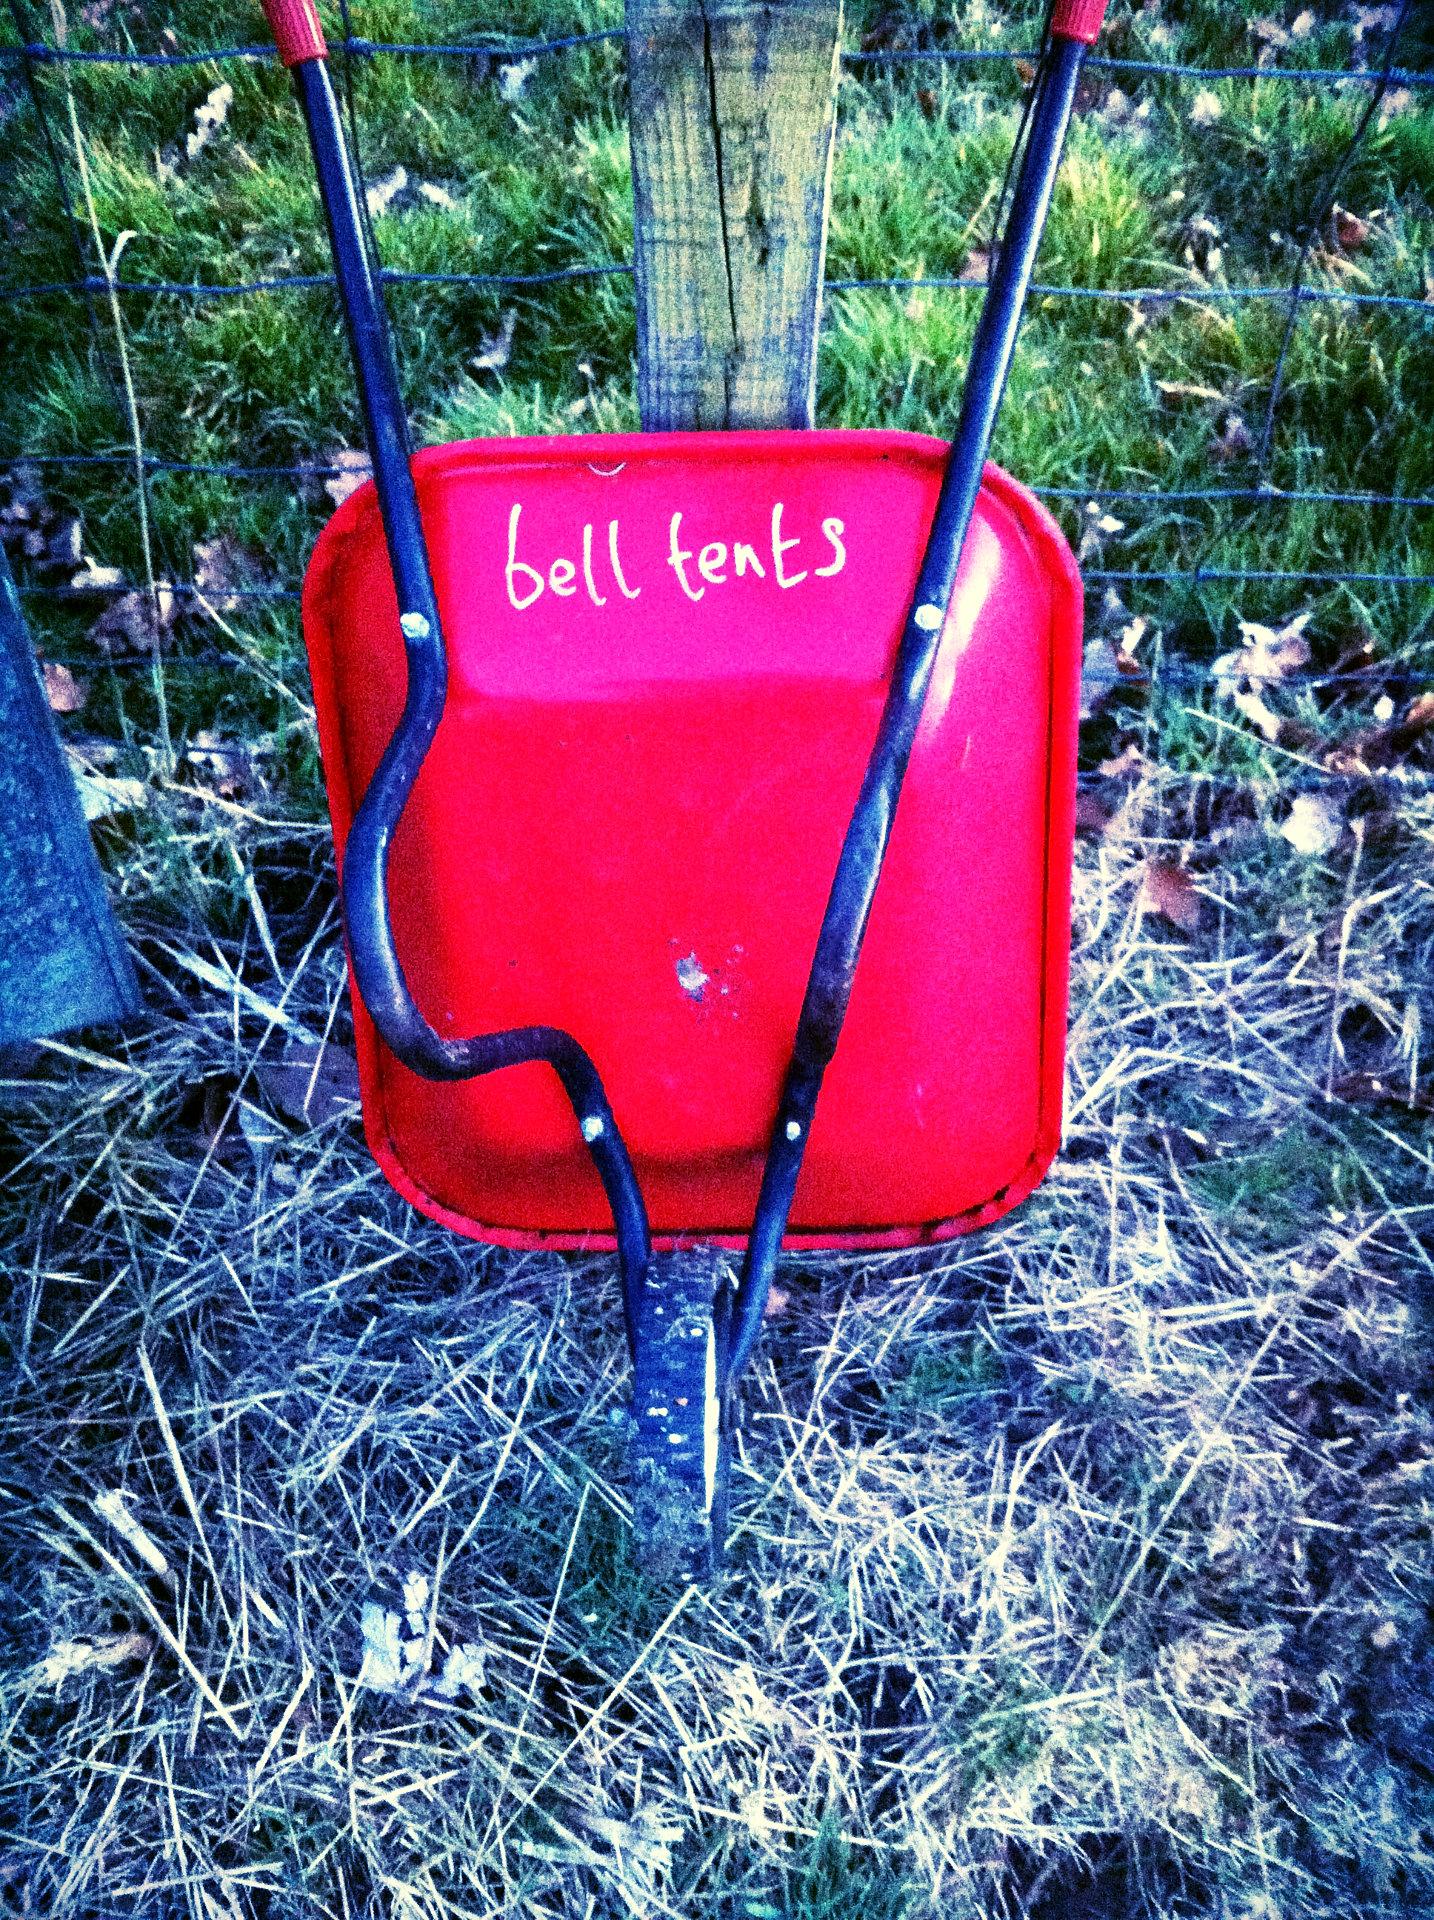 sc 1 st  Amberu0027s Bell Tent C&ing & Amberu0027s Bell Tent Camping | Glamping | UK | Amberu0027s Bell Tent Camping